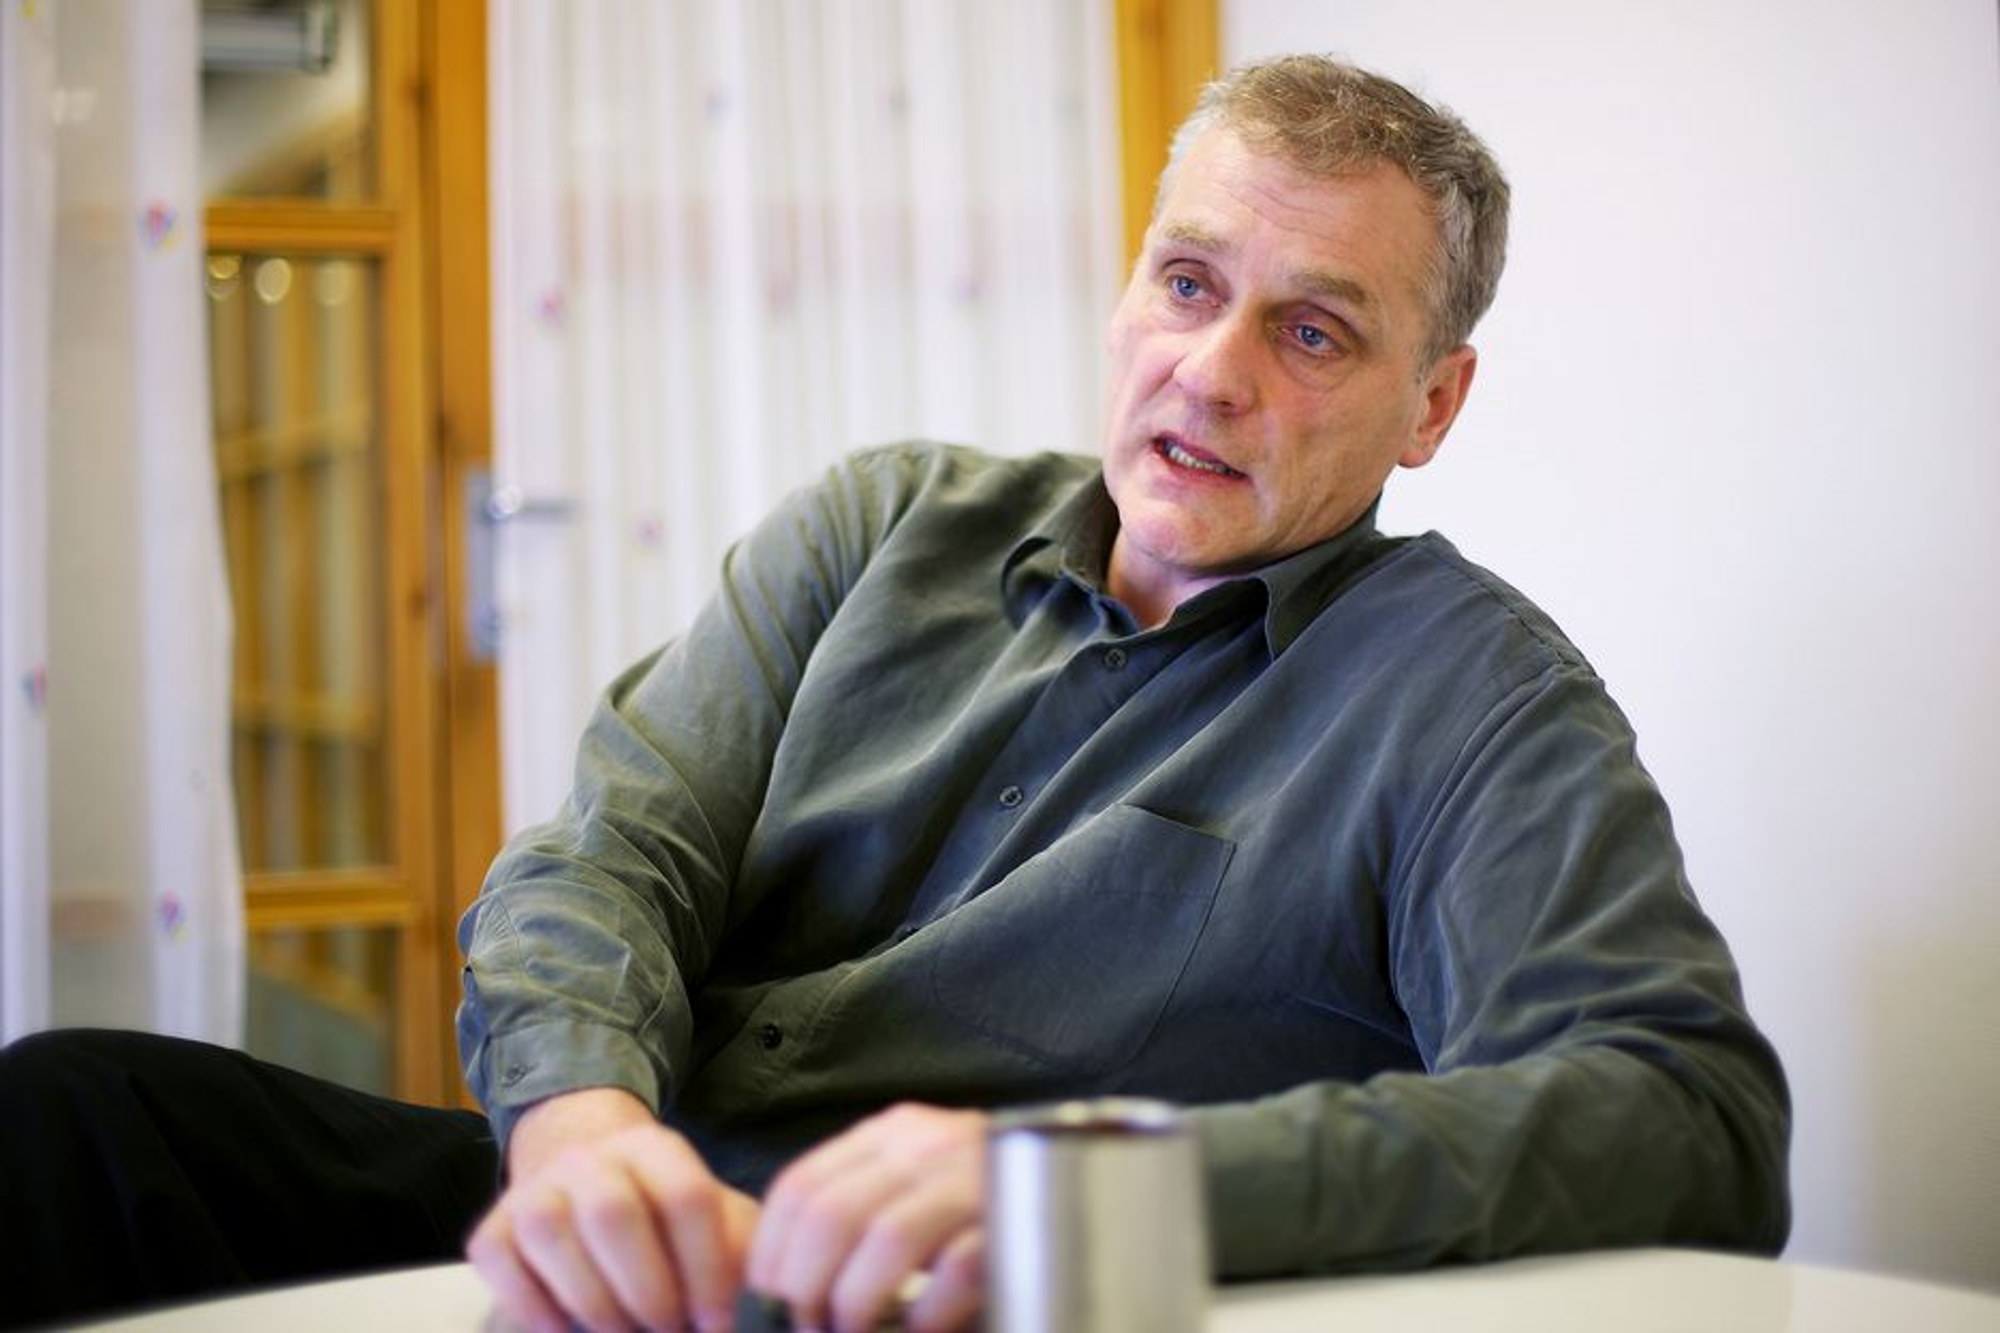 KRONIKKFORFATTEREN: Pål Prestrud er direktør ved Cicero Senter for klimaforskning.